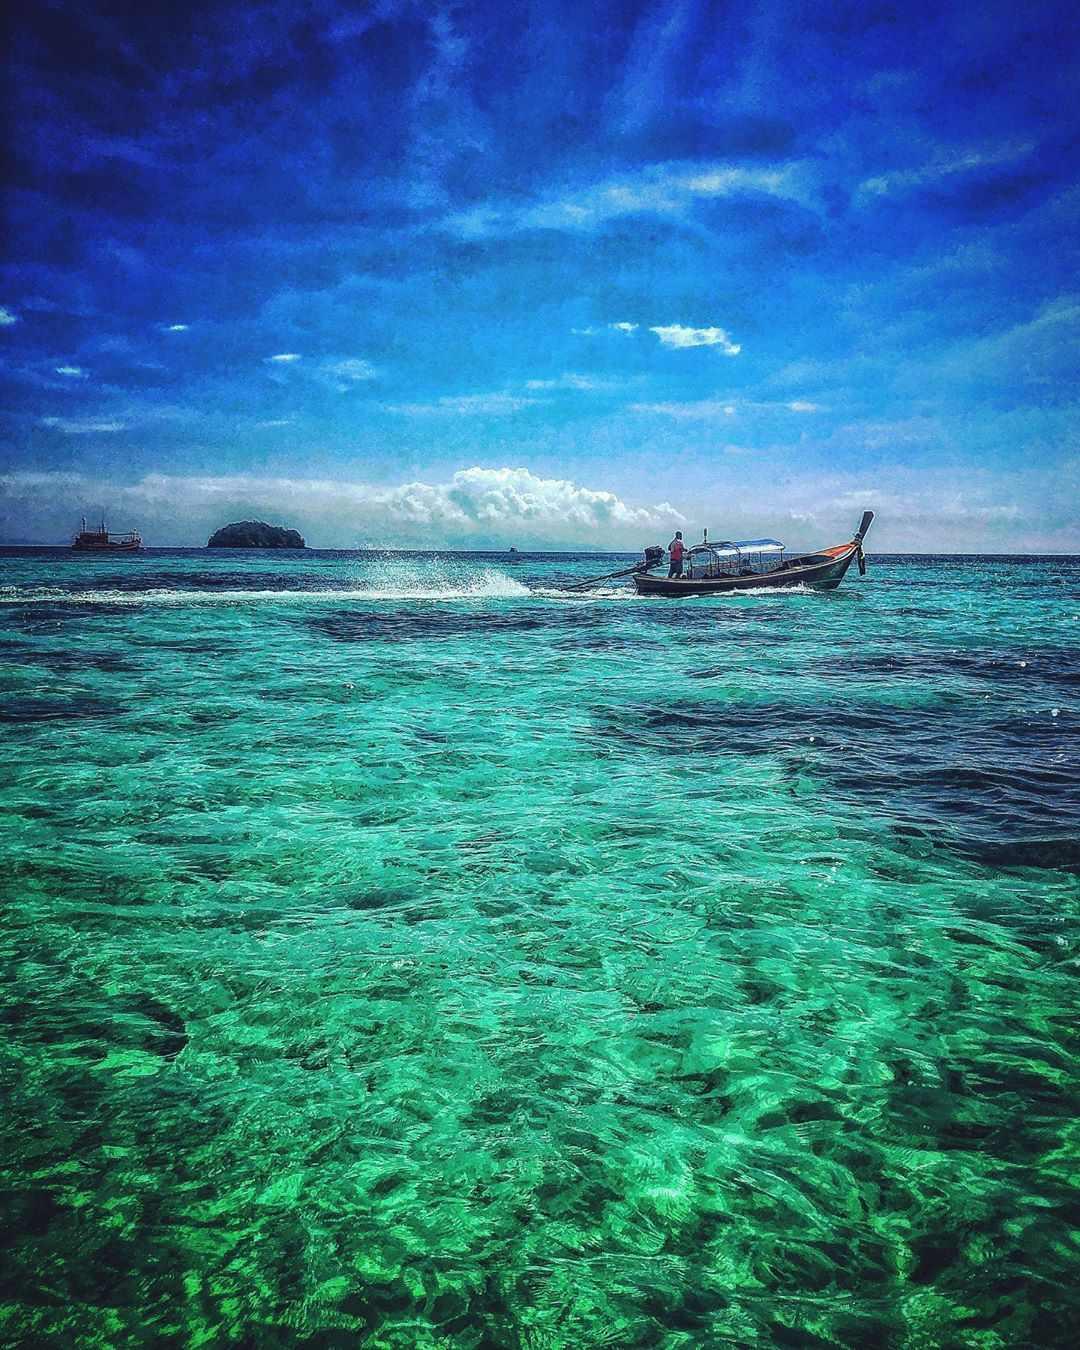 Het heldere blauwgroene water van Koh Lipe